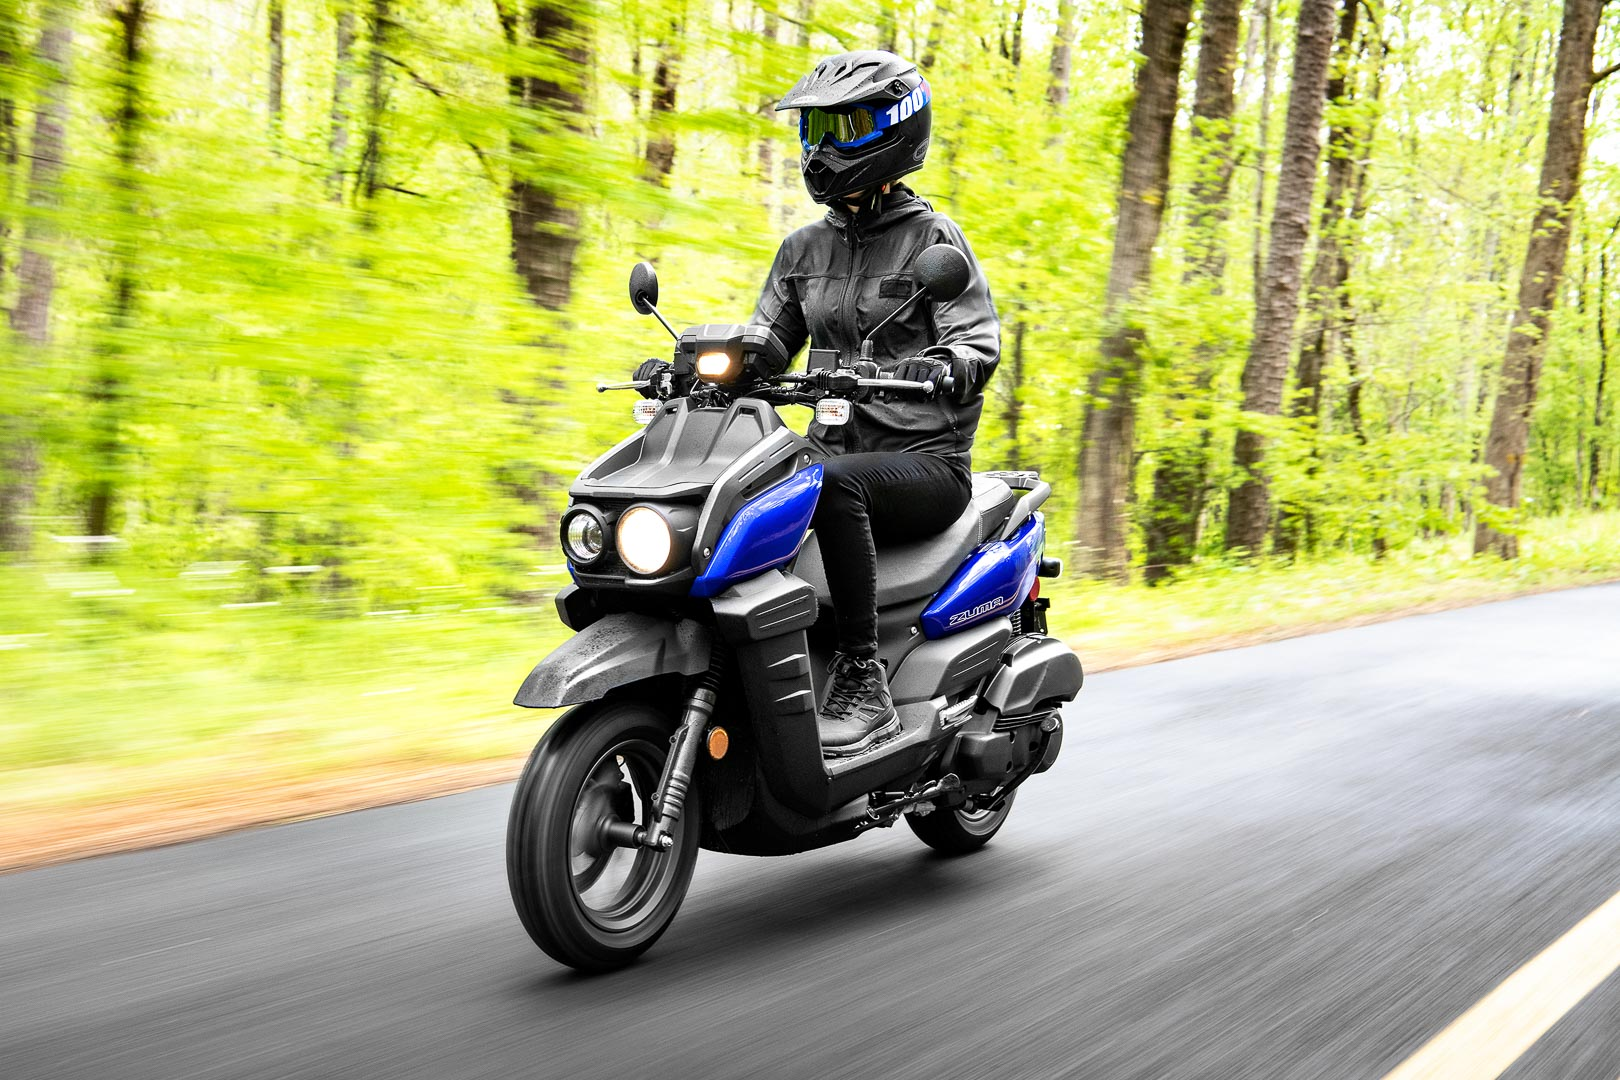 2022 Yamaha Zuma 125 ADV Scooter First Look (9 Fast Facts)